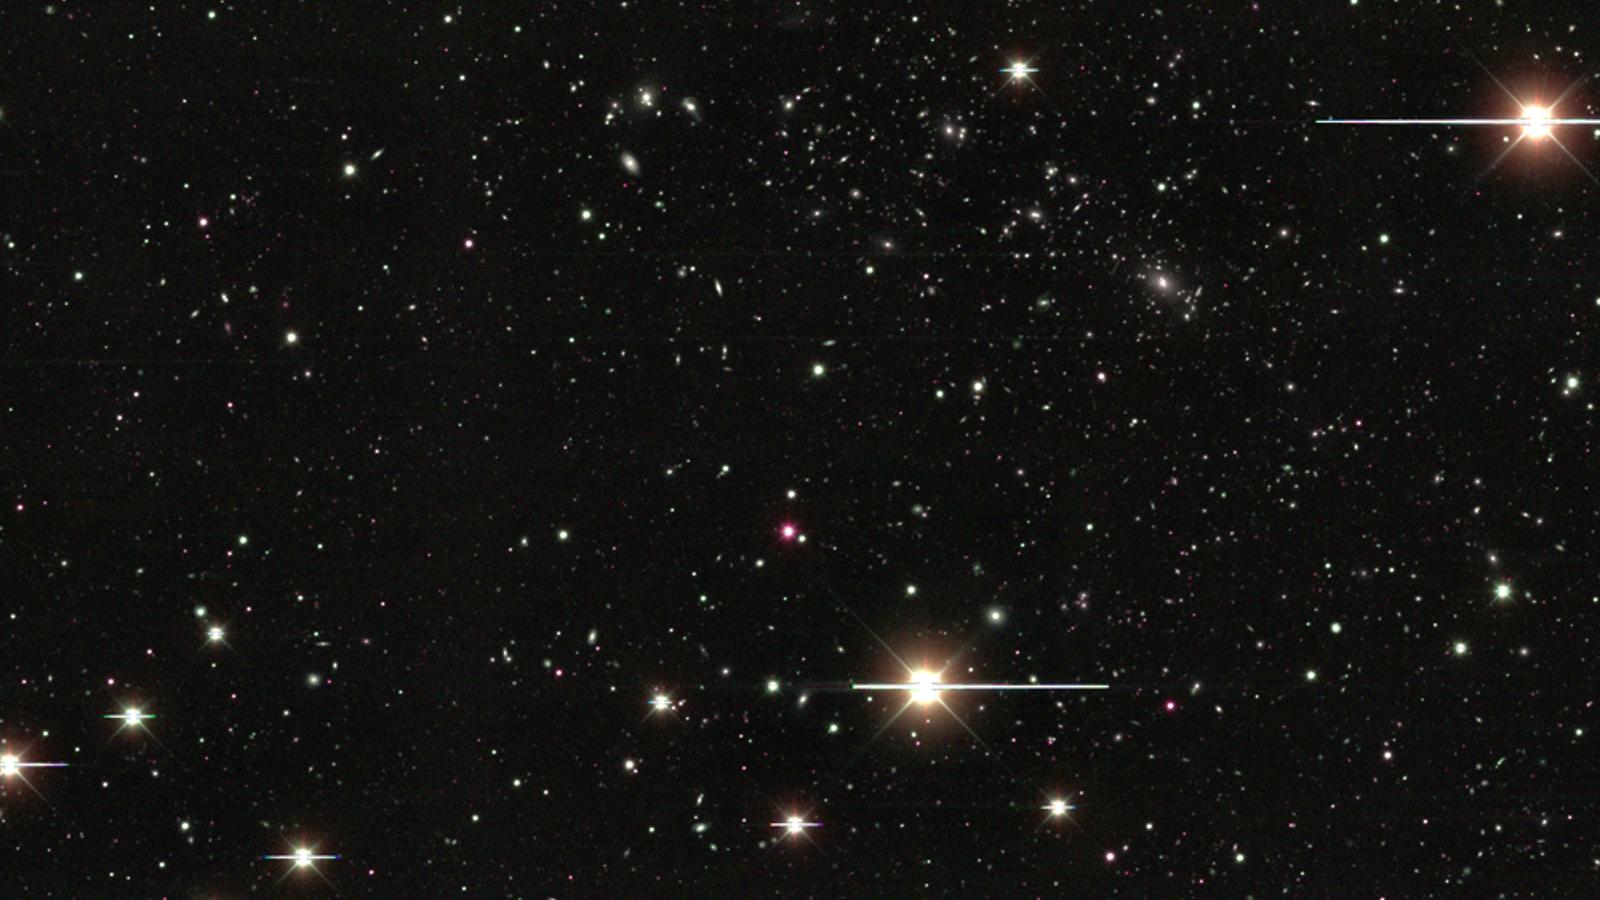 virgo stellar stream